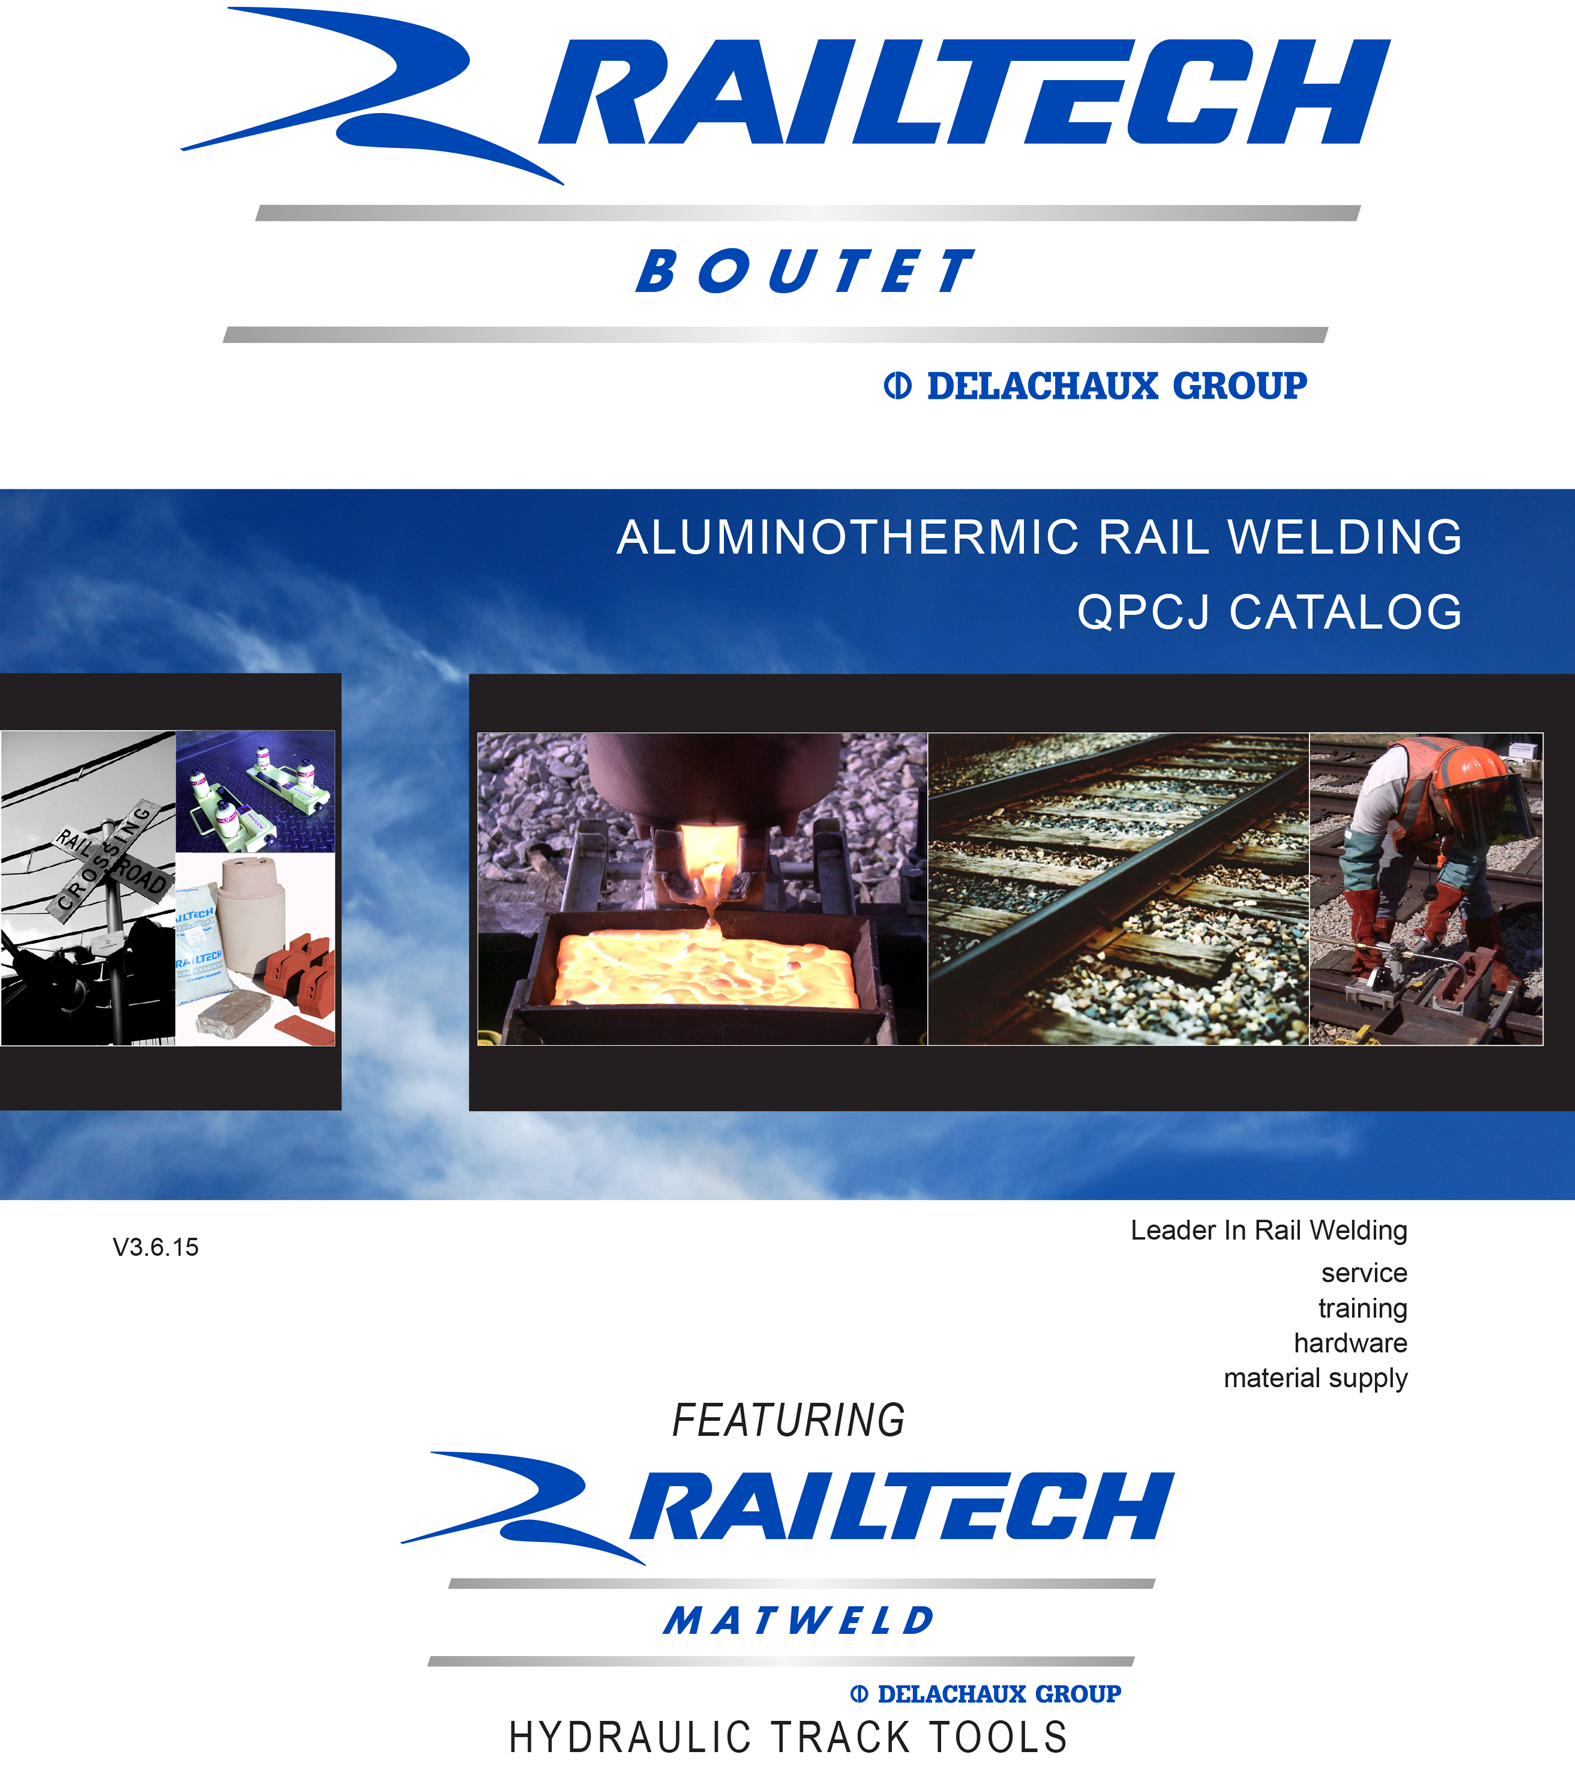 2015 Railtech Boutet Catalog